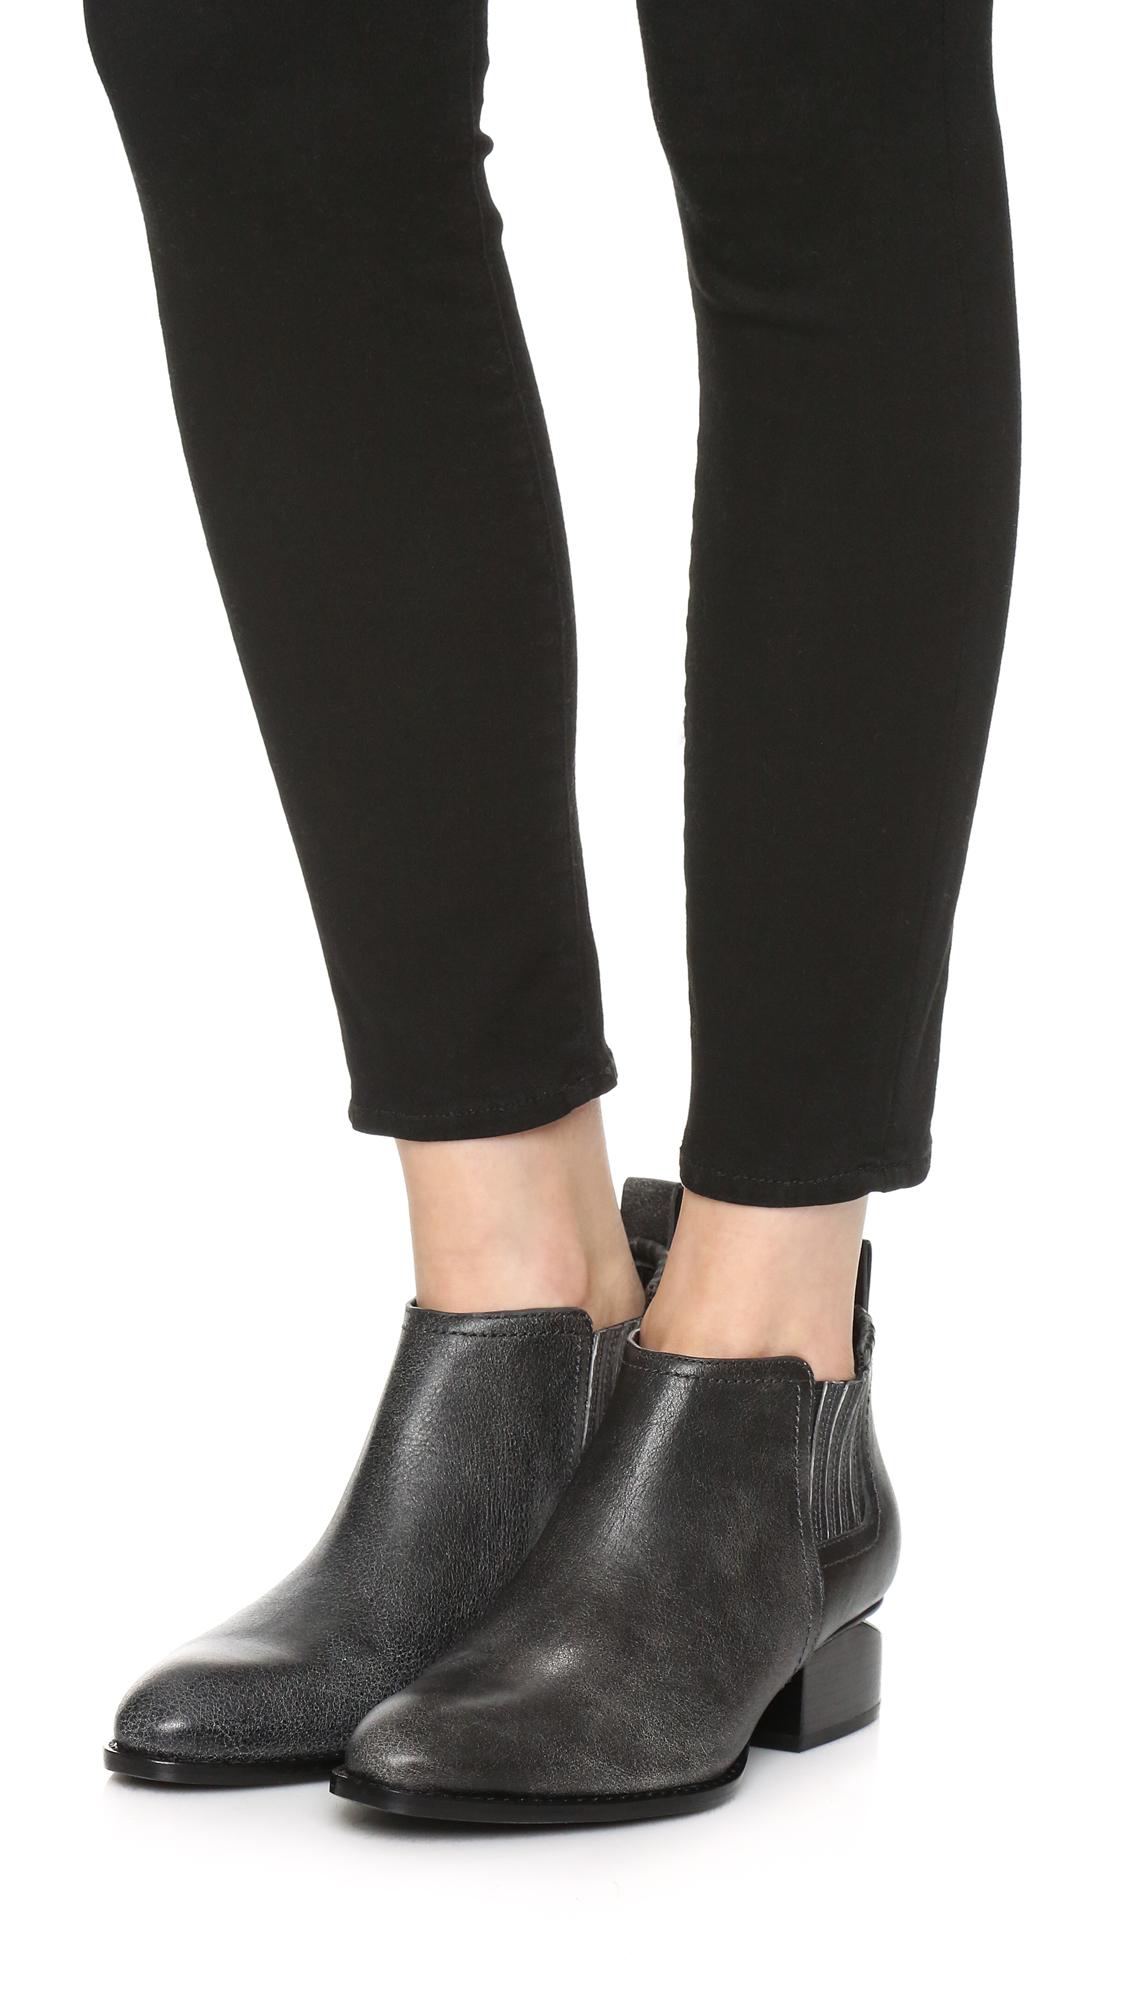 lyst alexander wang kori ankle booties in black. Black Bedroom Furniture Sets. Home Design Ideas